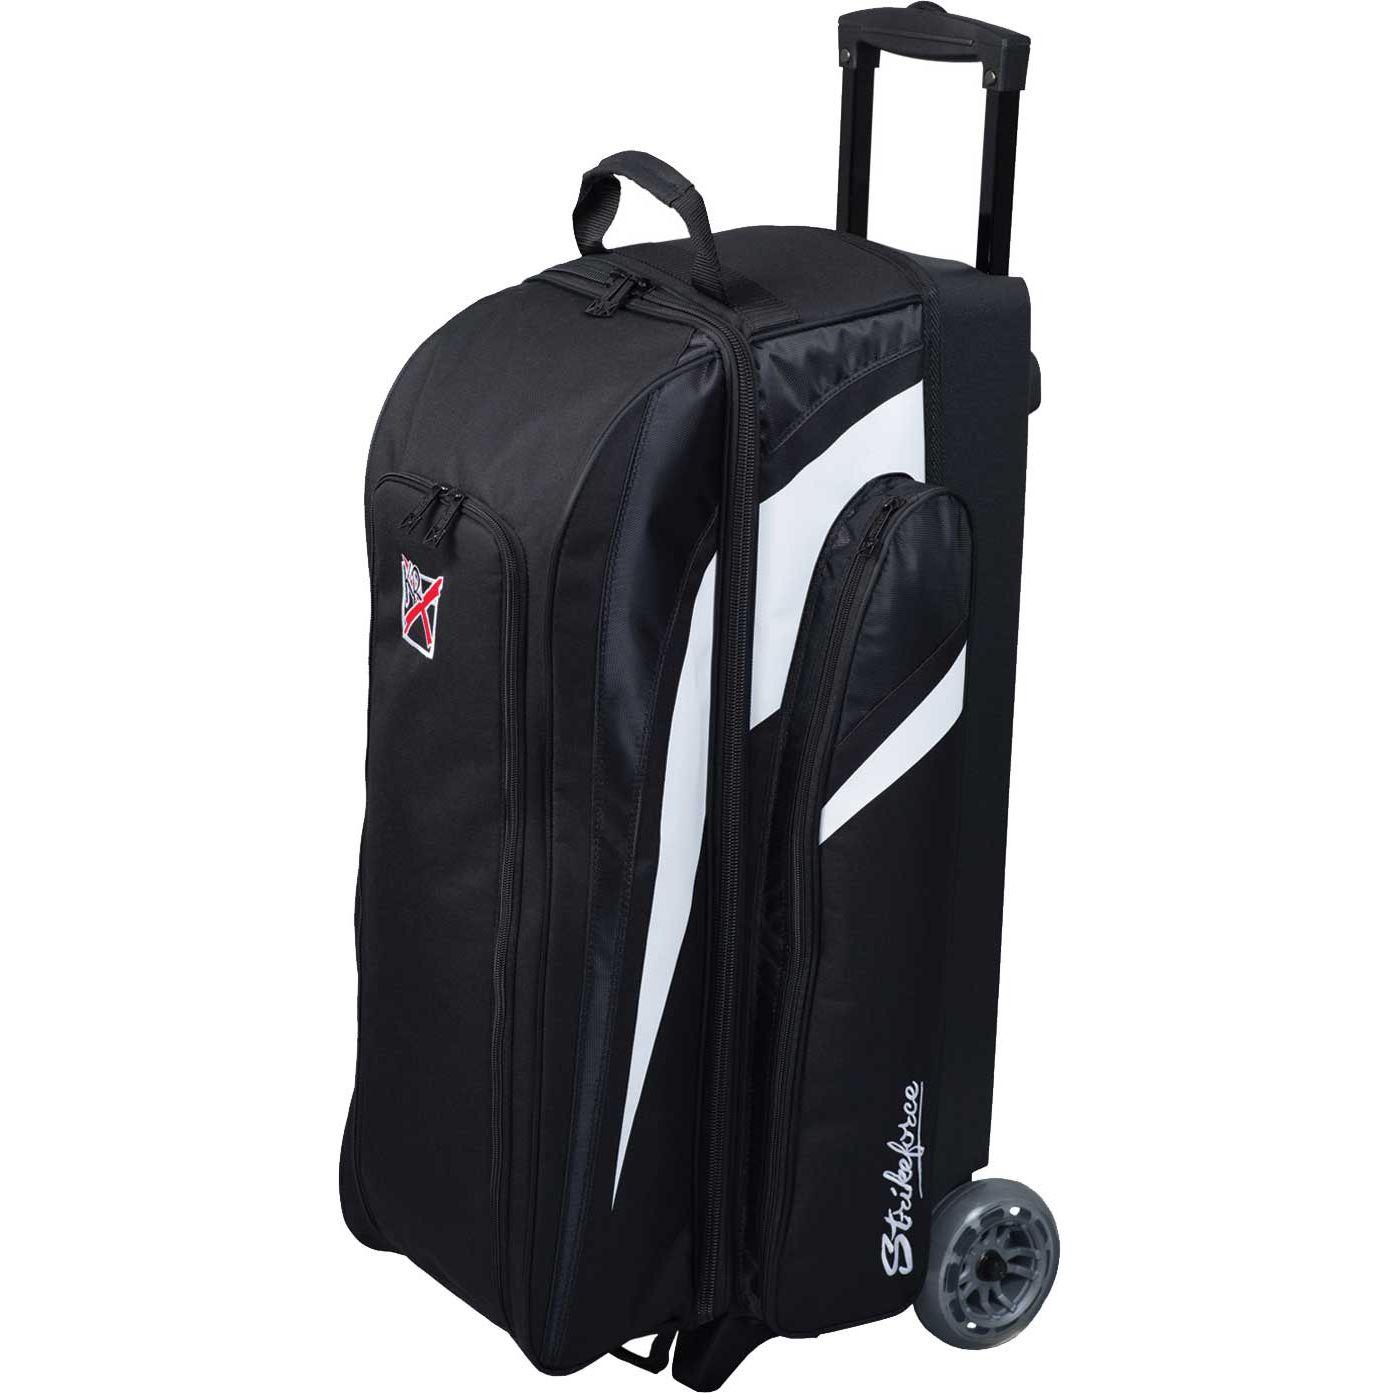 Strikeforce Cruiser Triple Ball Roller Bowling Bag